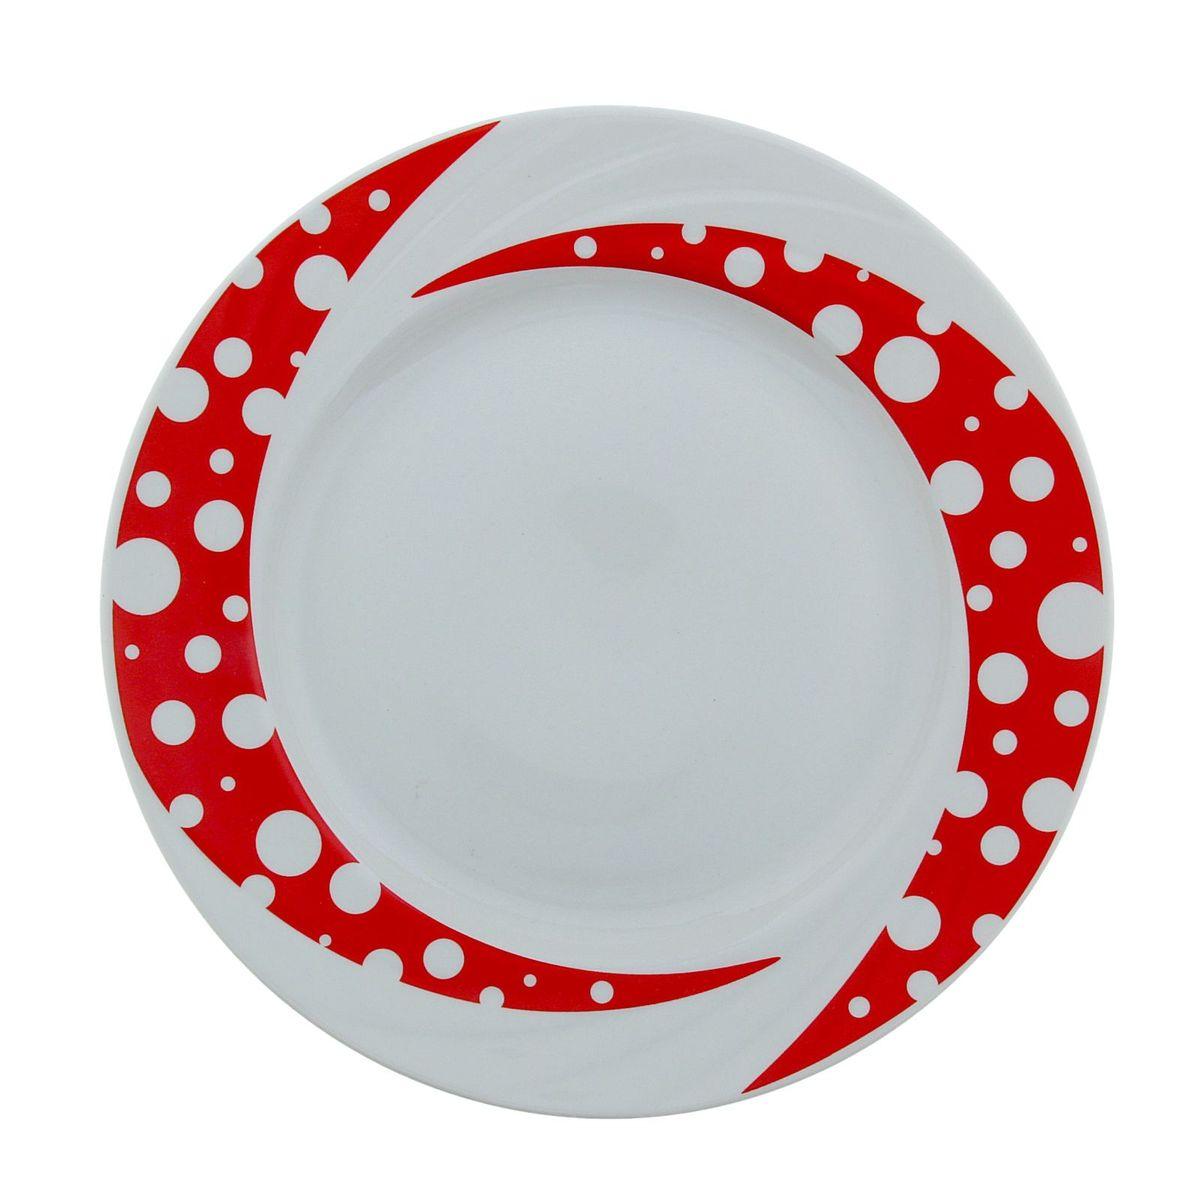 Тарелка мелкая Голубка. Горох, диаметр 24 см508029